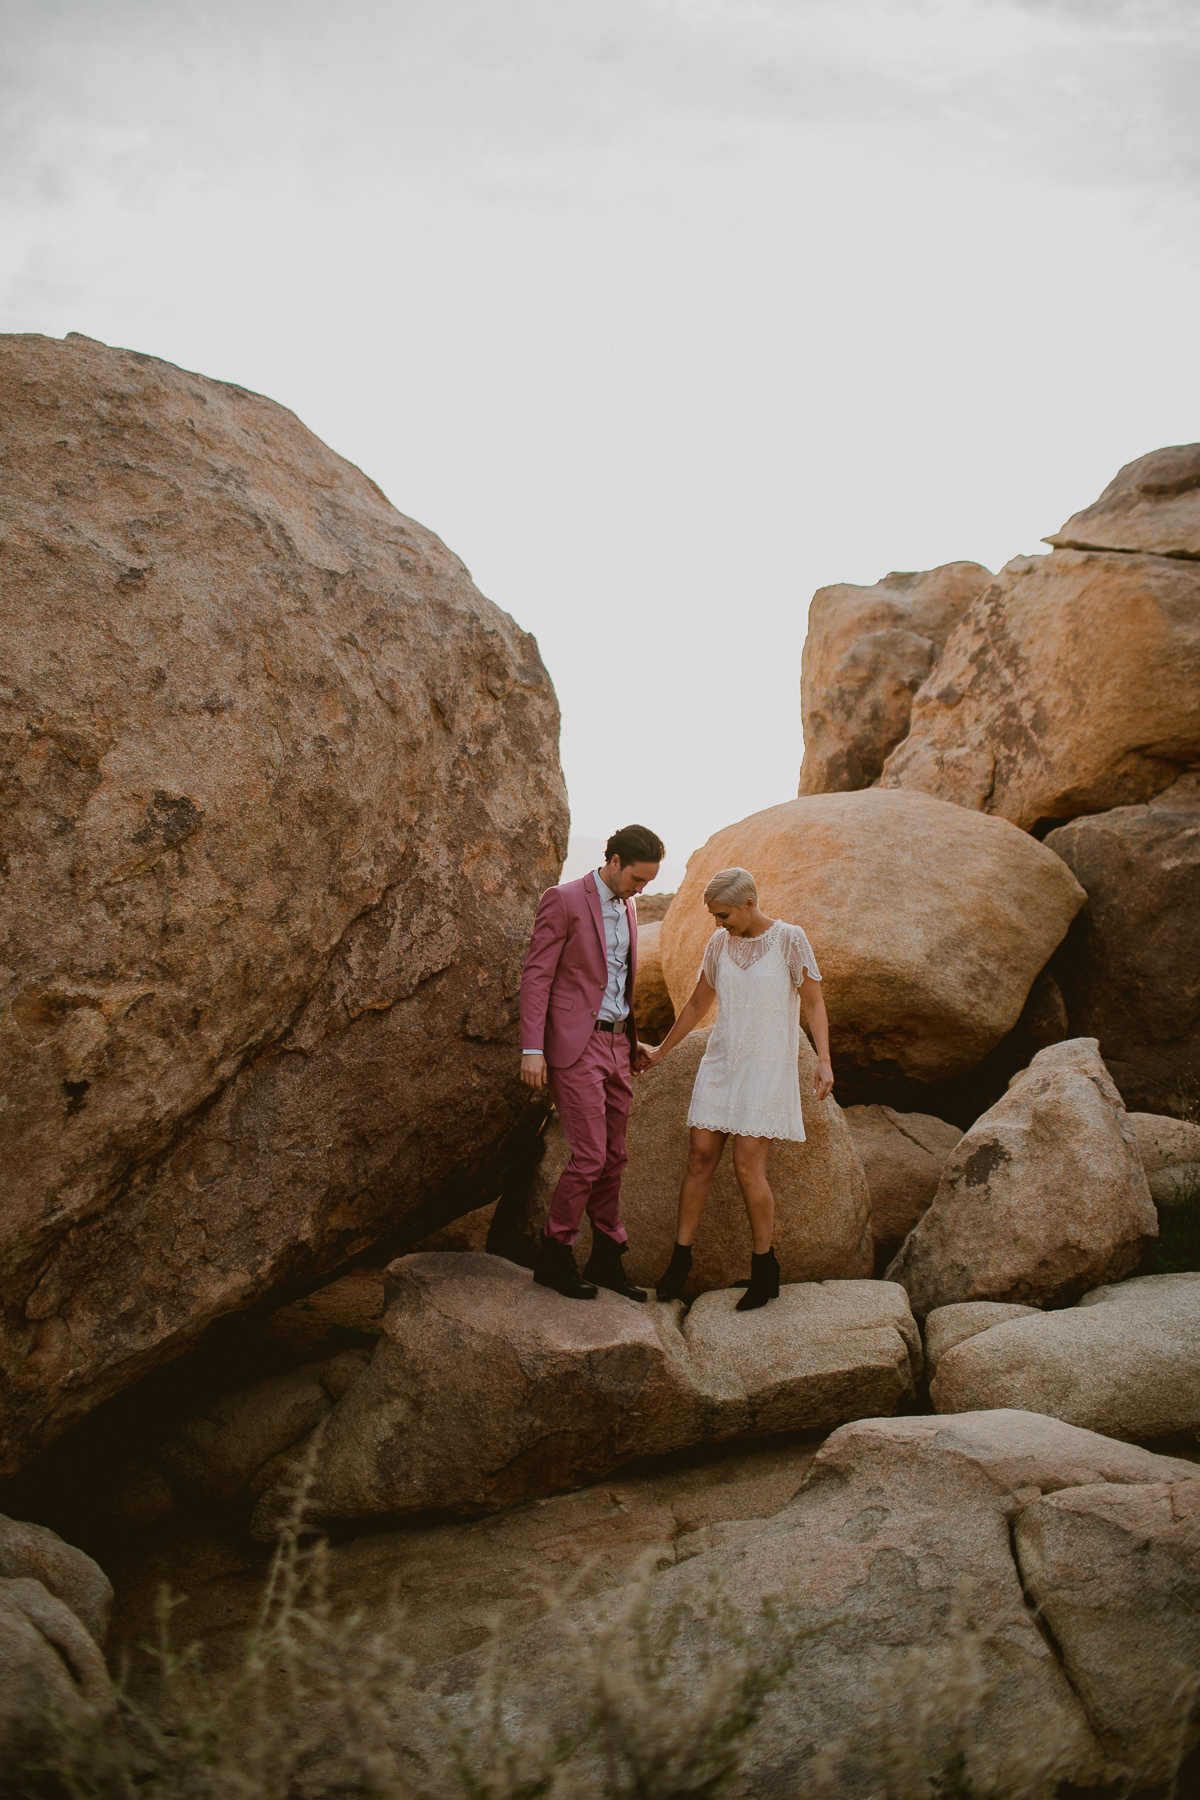 joshua-tree-national-park-engagement-kelley-raye-los-angeles-wedding-photographer-78.jpg